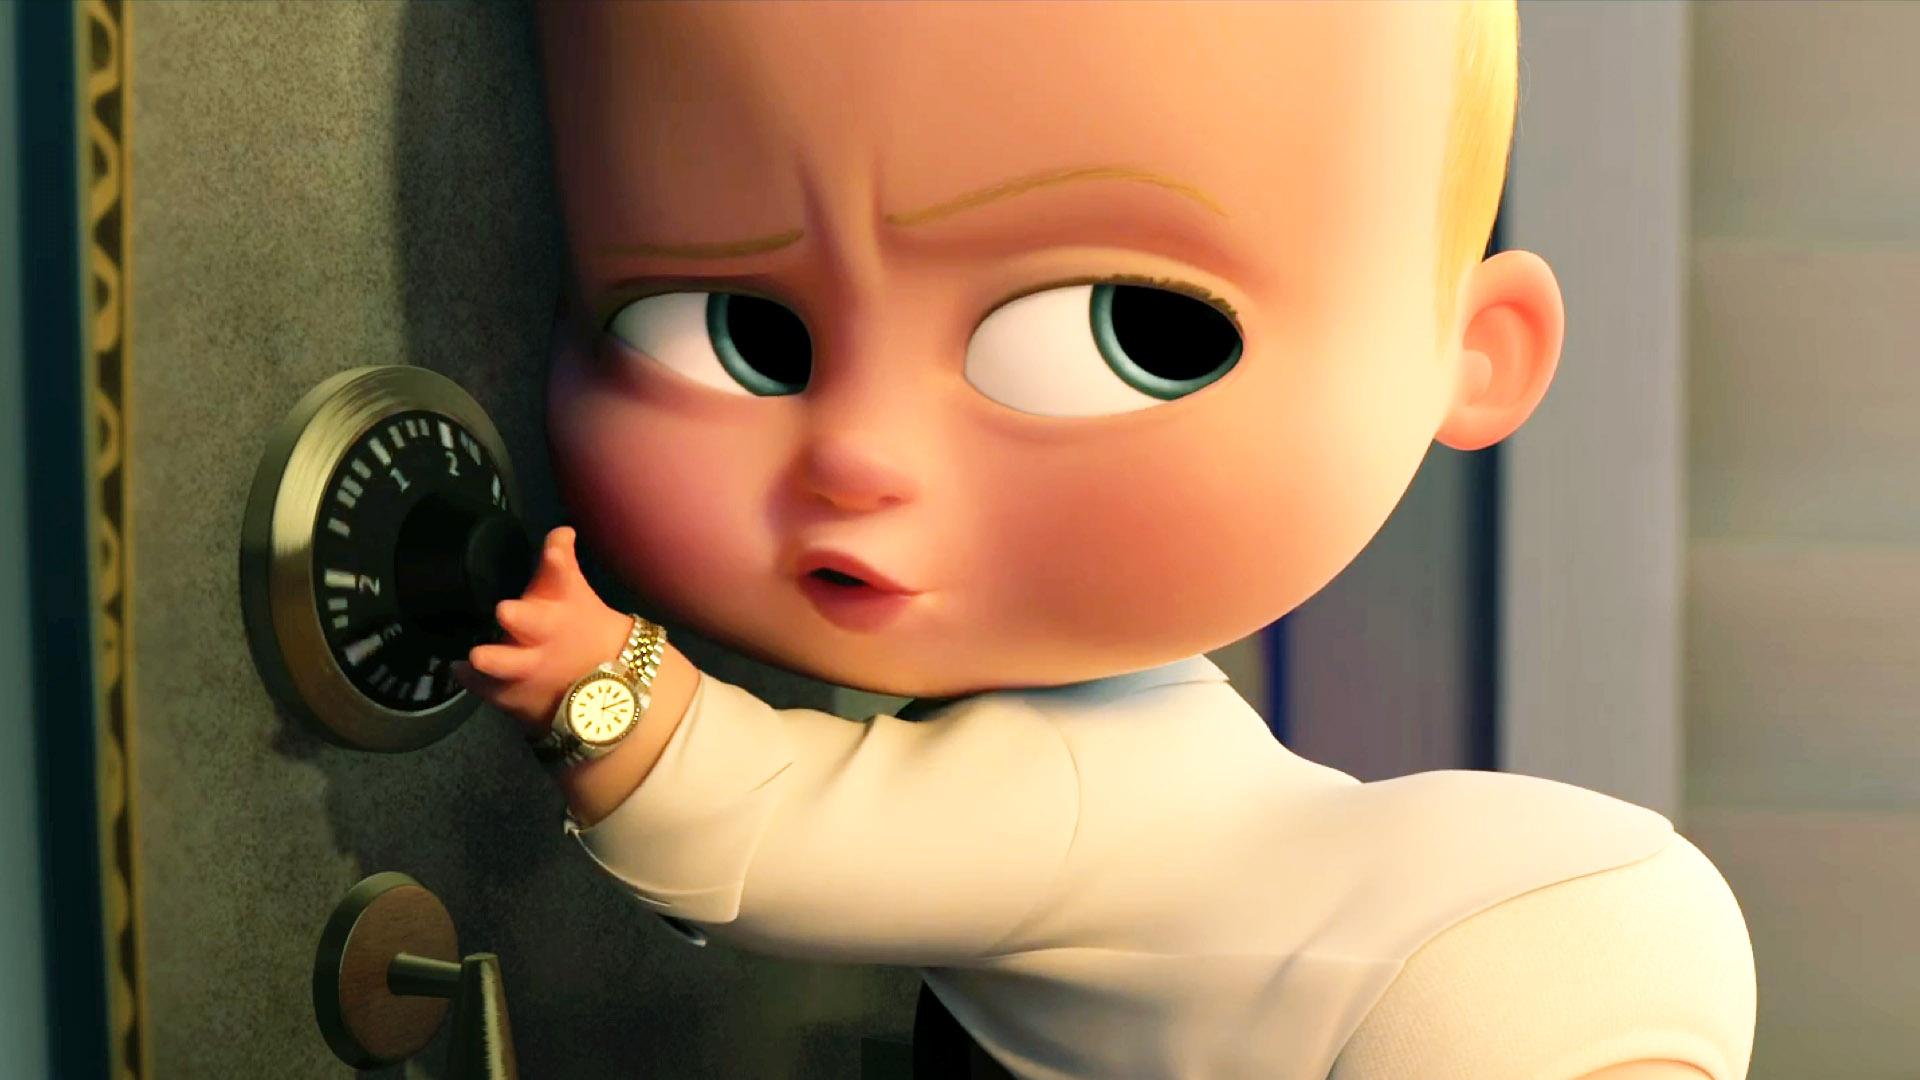 「The Boss Baby」的圖片搜尋結果